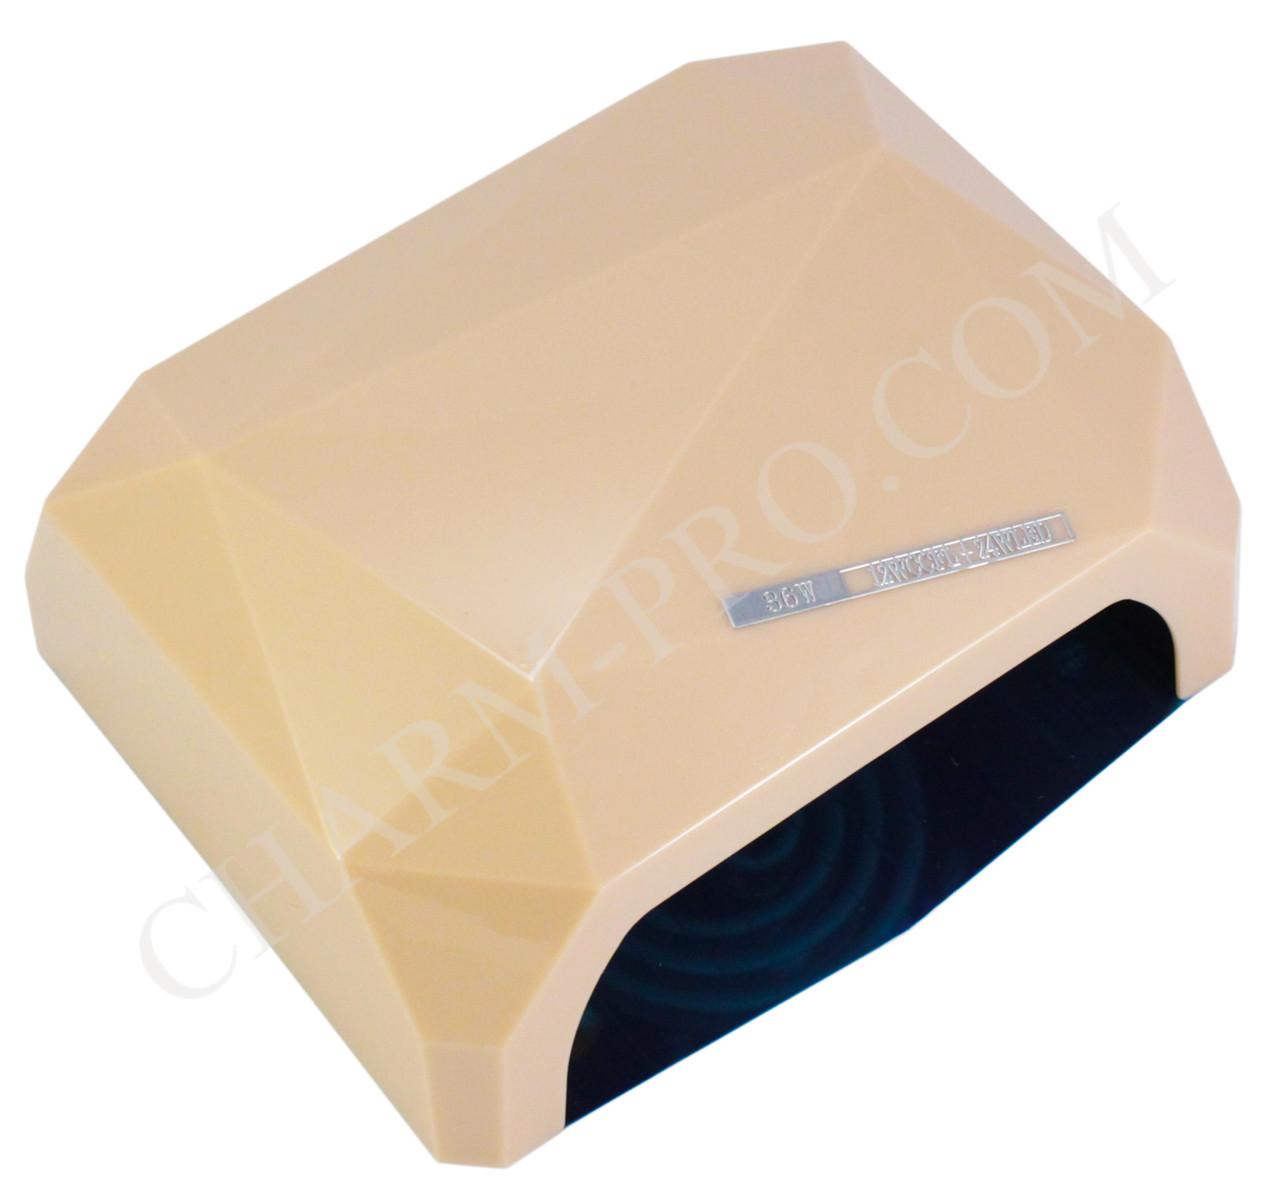 Комбинированная лампа для маникюра LED+CCFL Diamond (Бежевая)